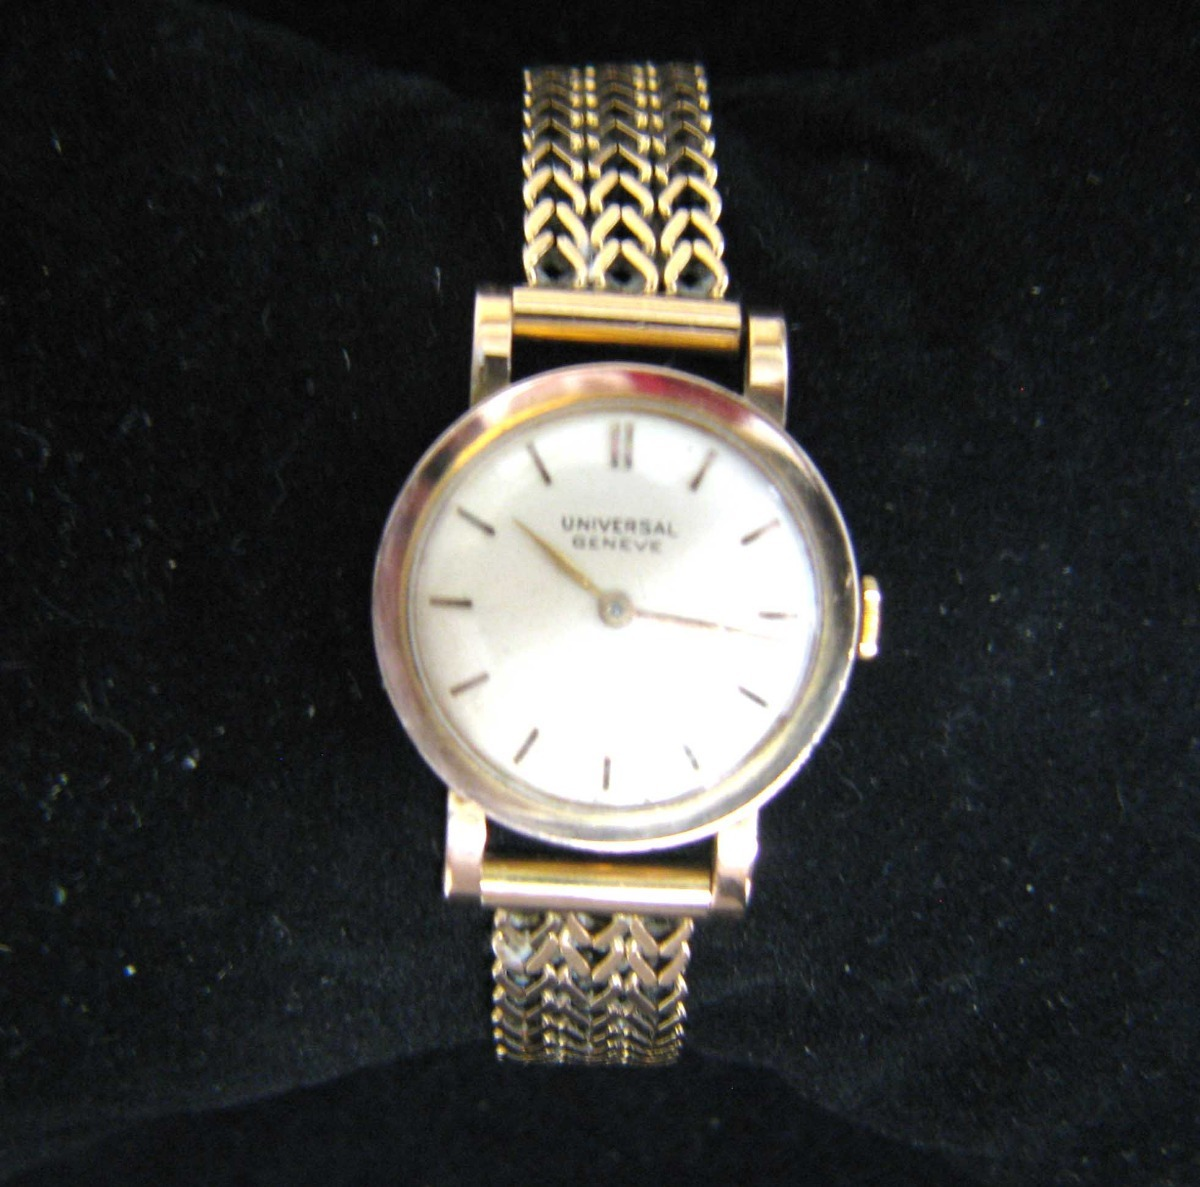 dce2299a547 relógio universal geneve polerouter - feminino - ouro 18k. Carregando zoom.